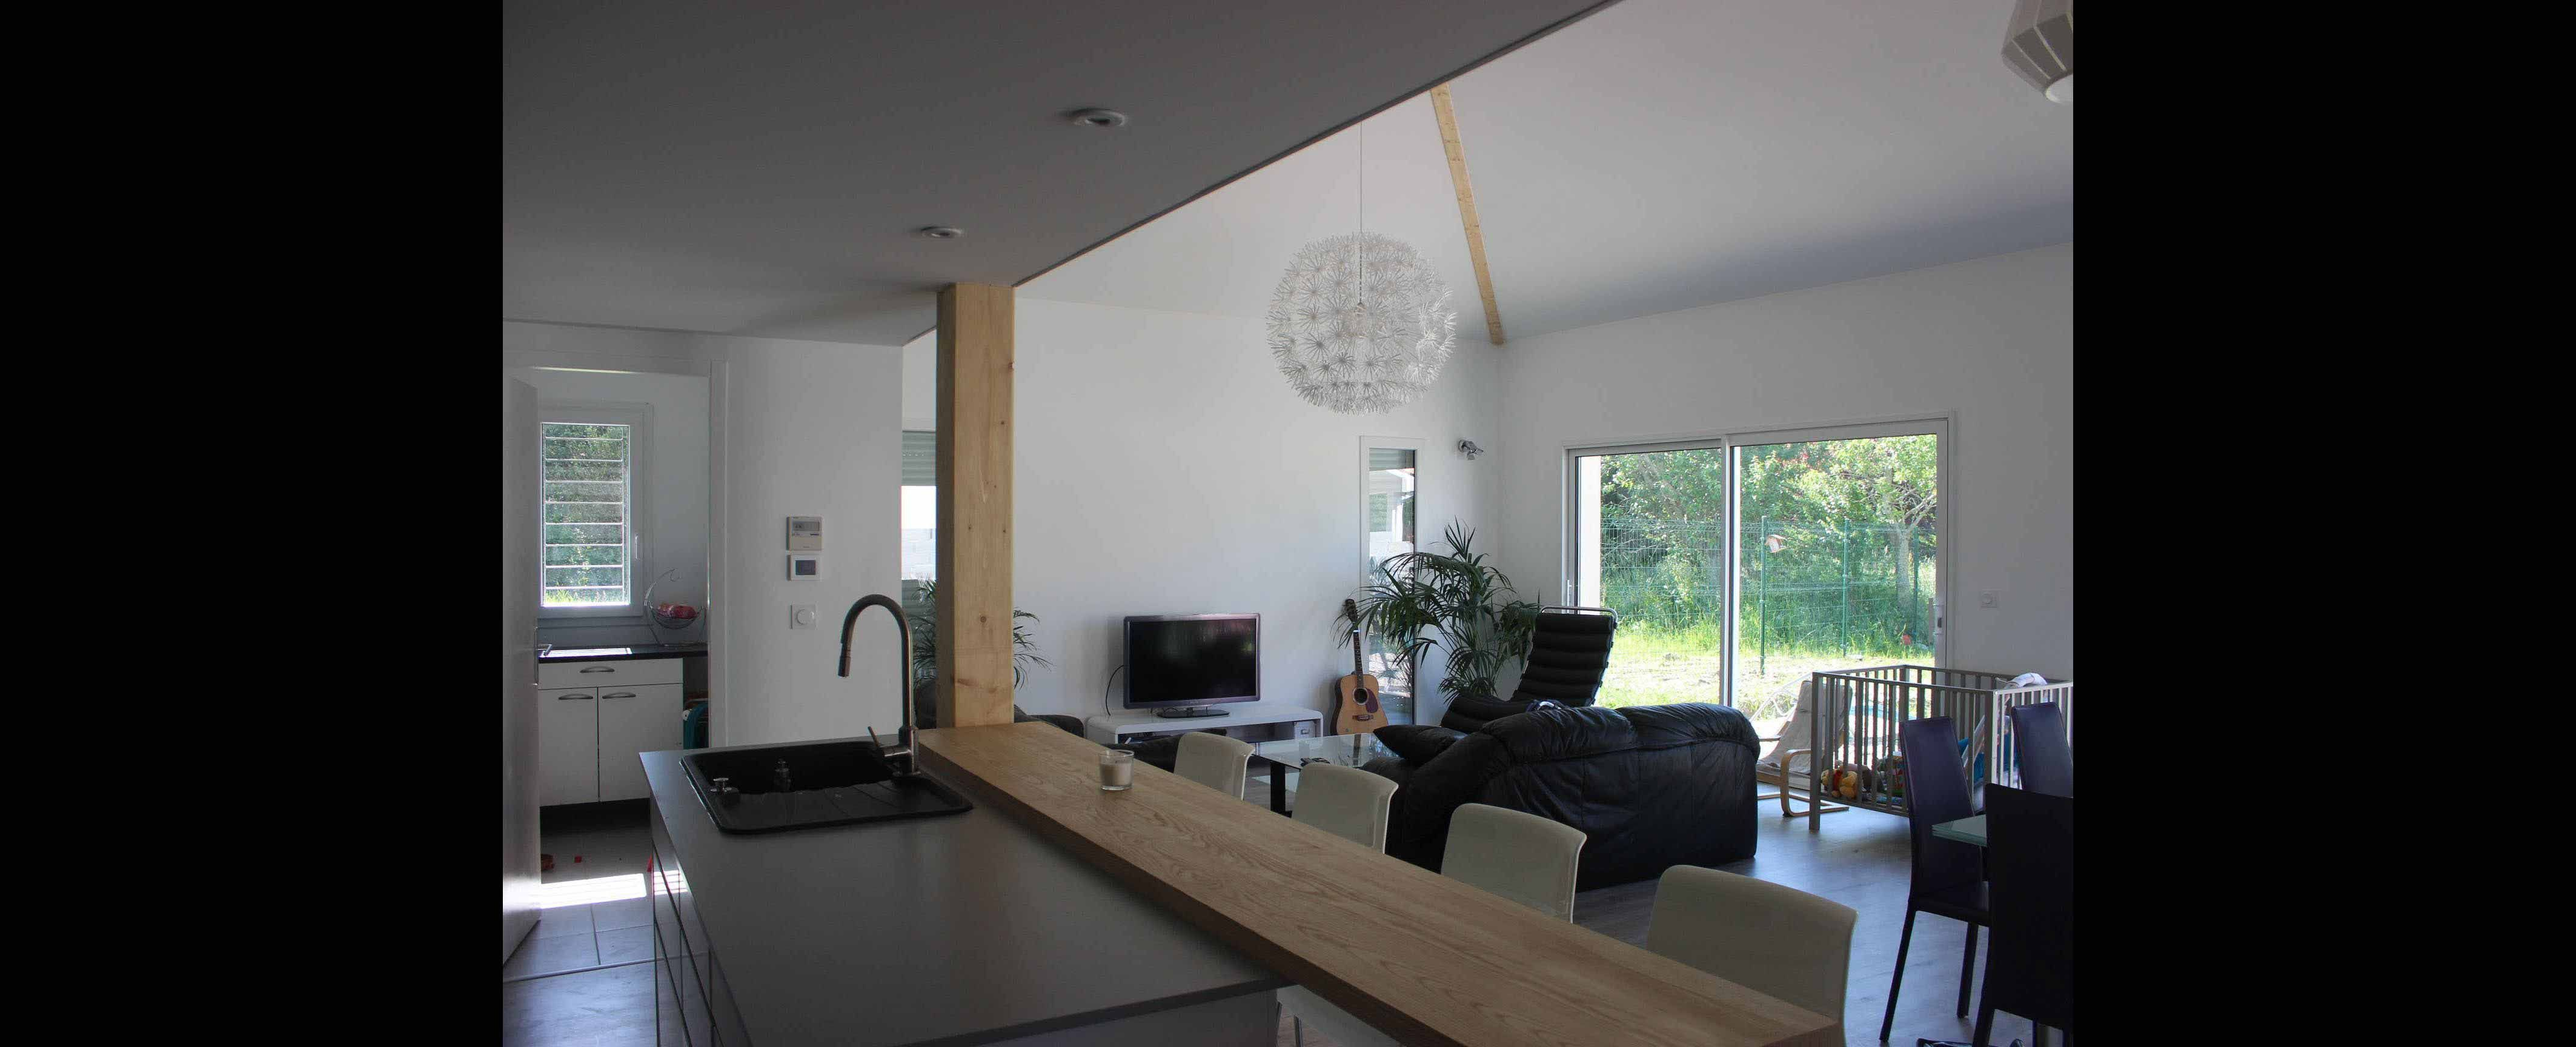 Plan Maison Plain Pied Mezzanine | Gallery Wallpaper